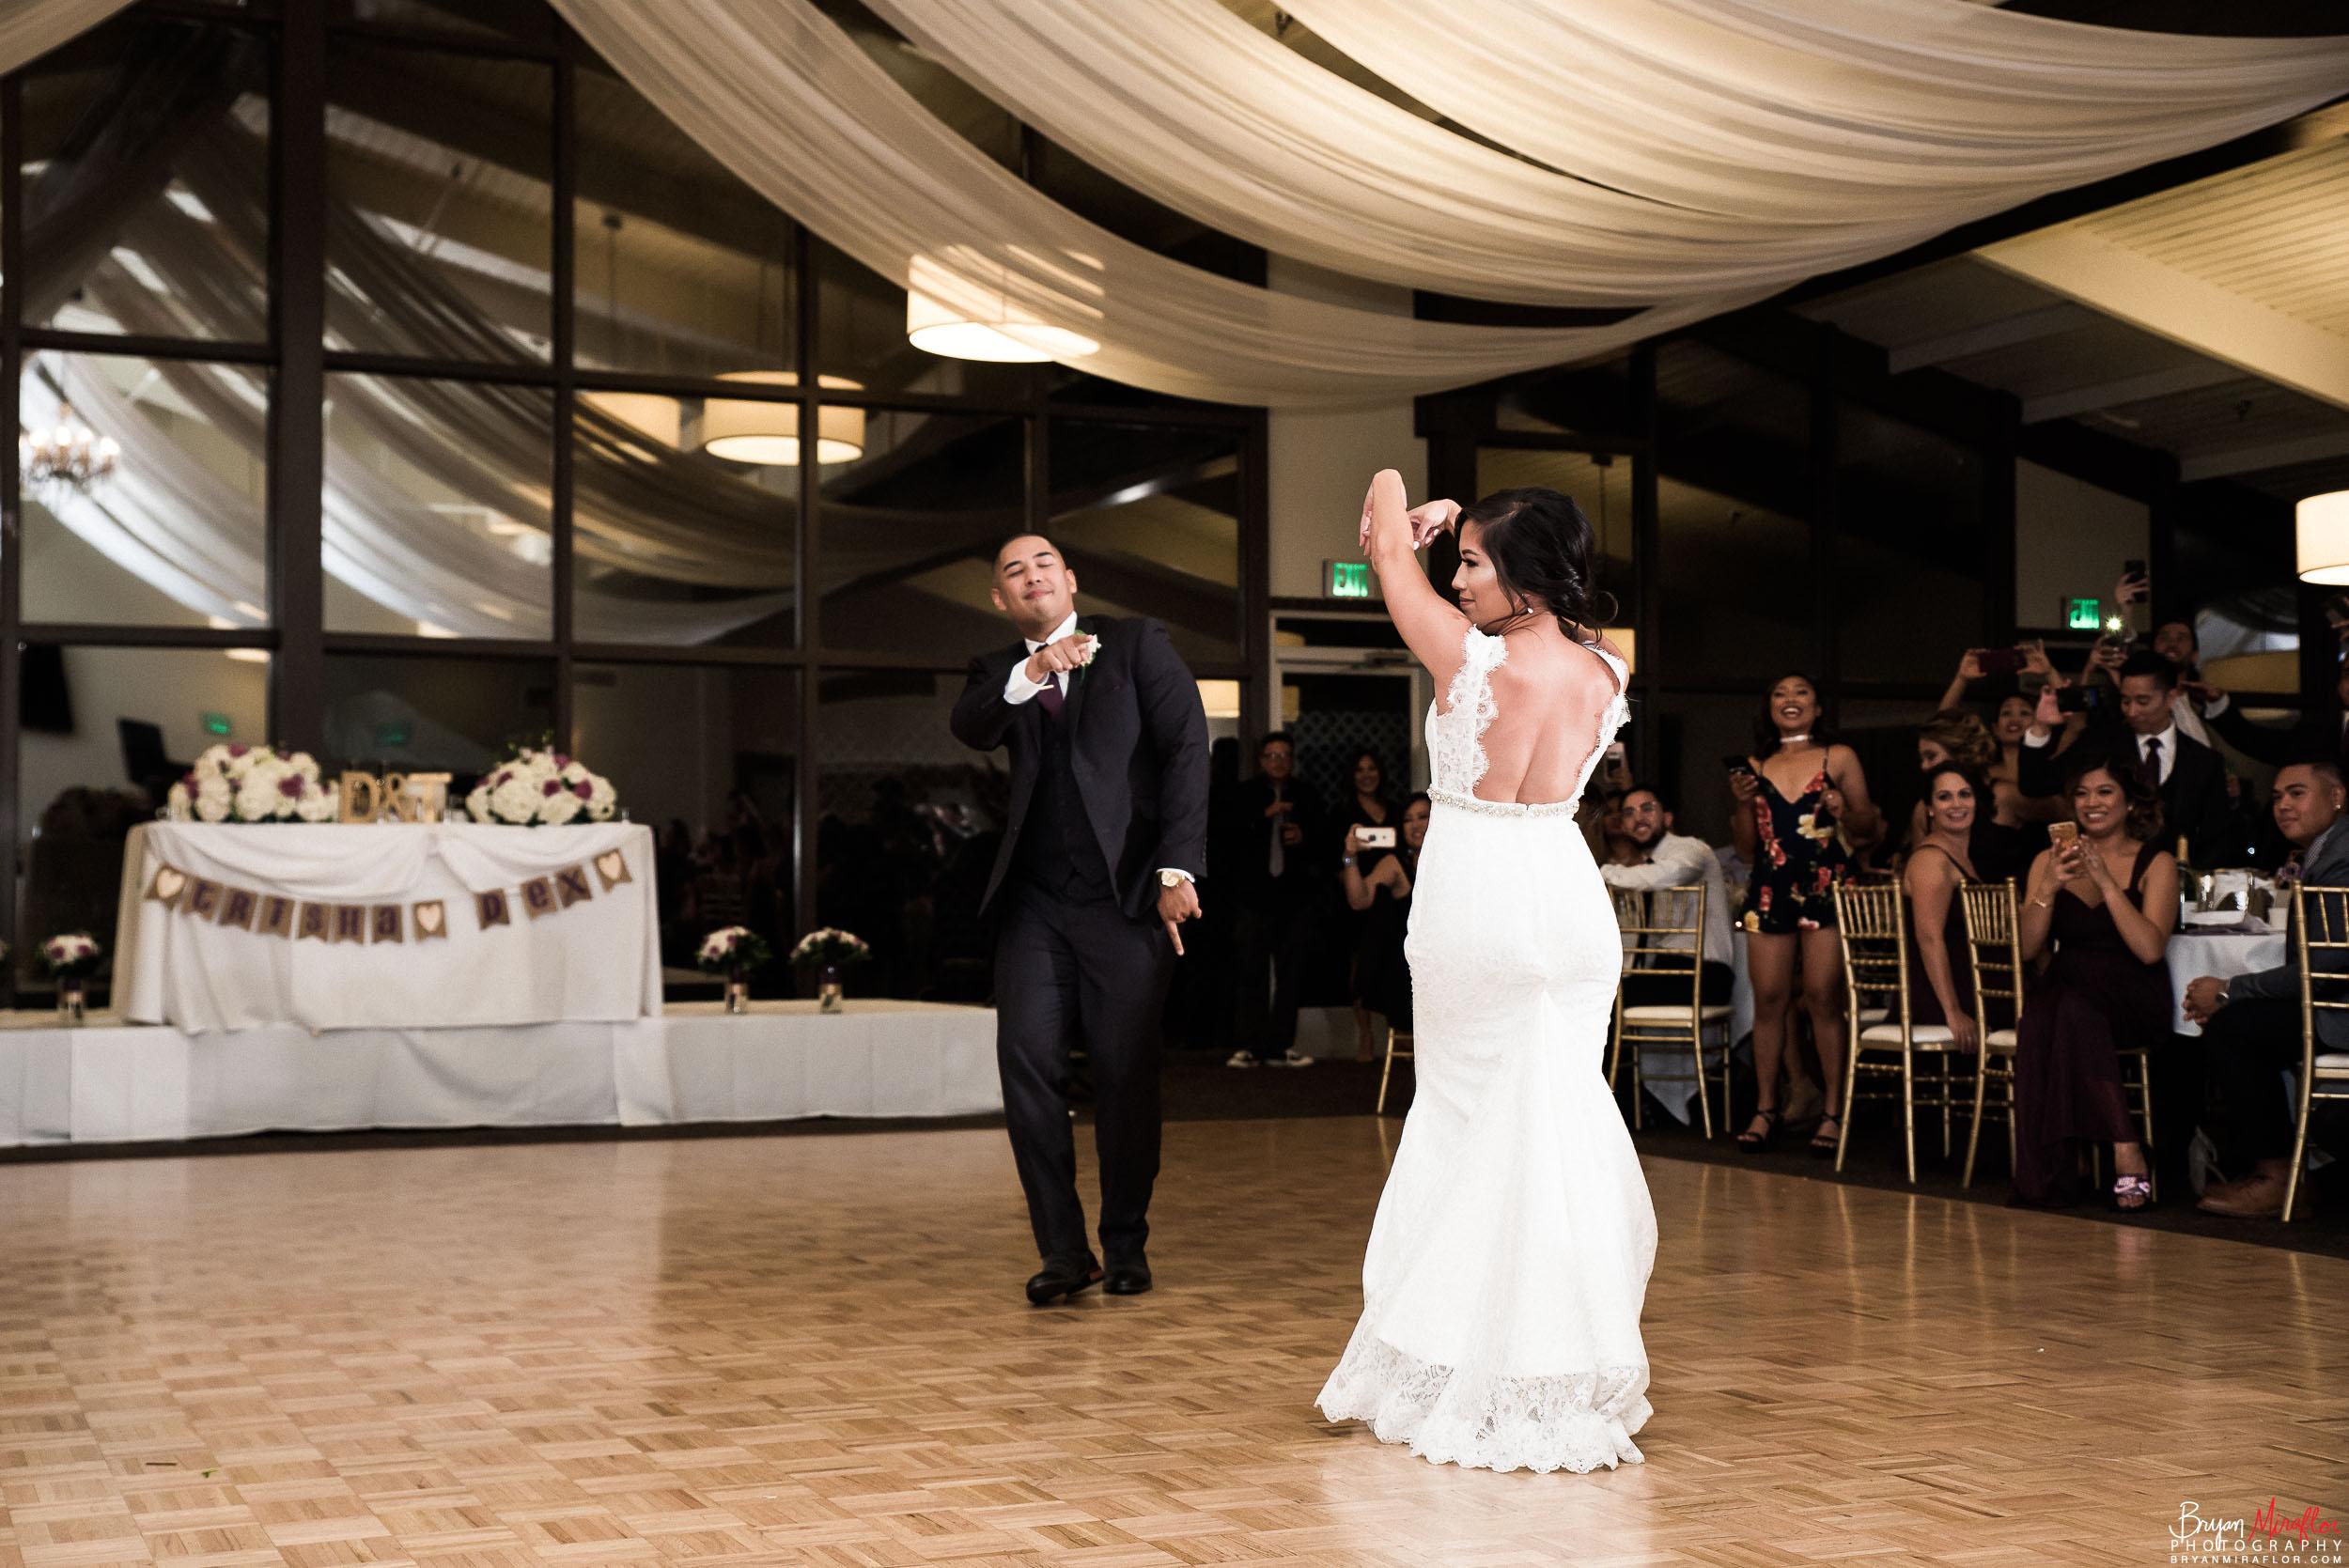 Bryan-Miraflor-Photography-Trisha-Dexter-Married-20170923-067.jpg